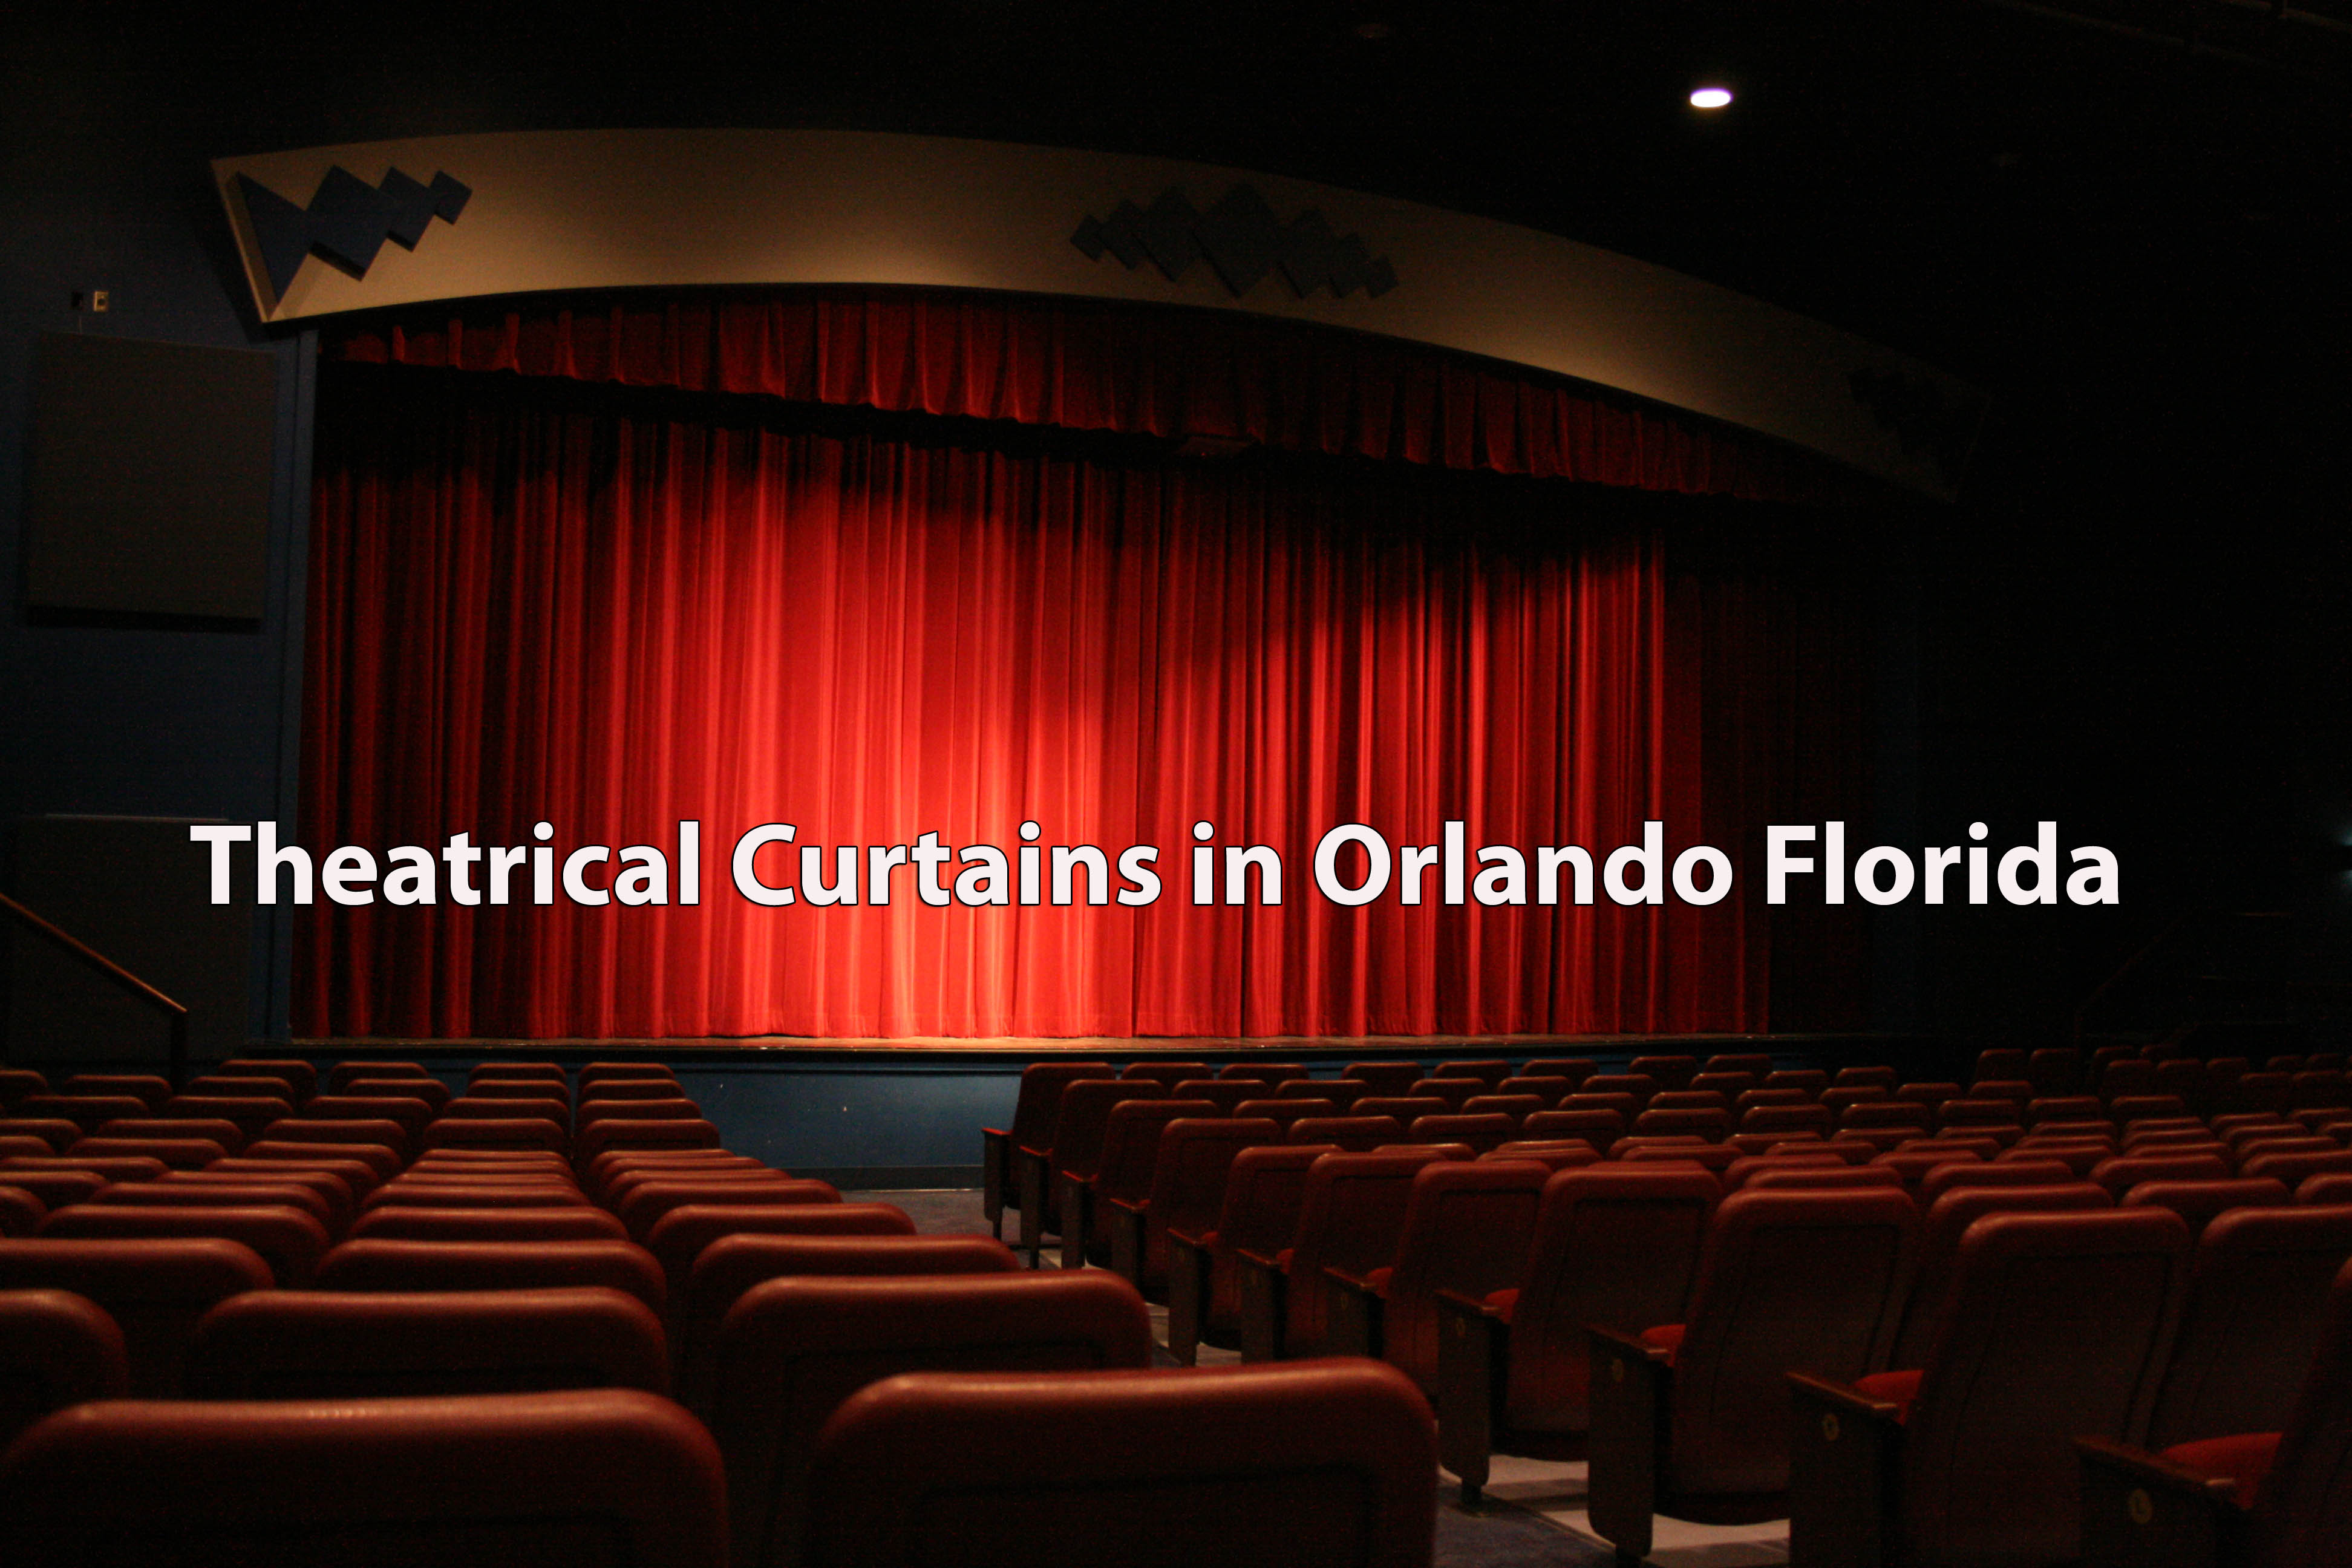 Theatrical Curtains in Orlando Florida